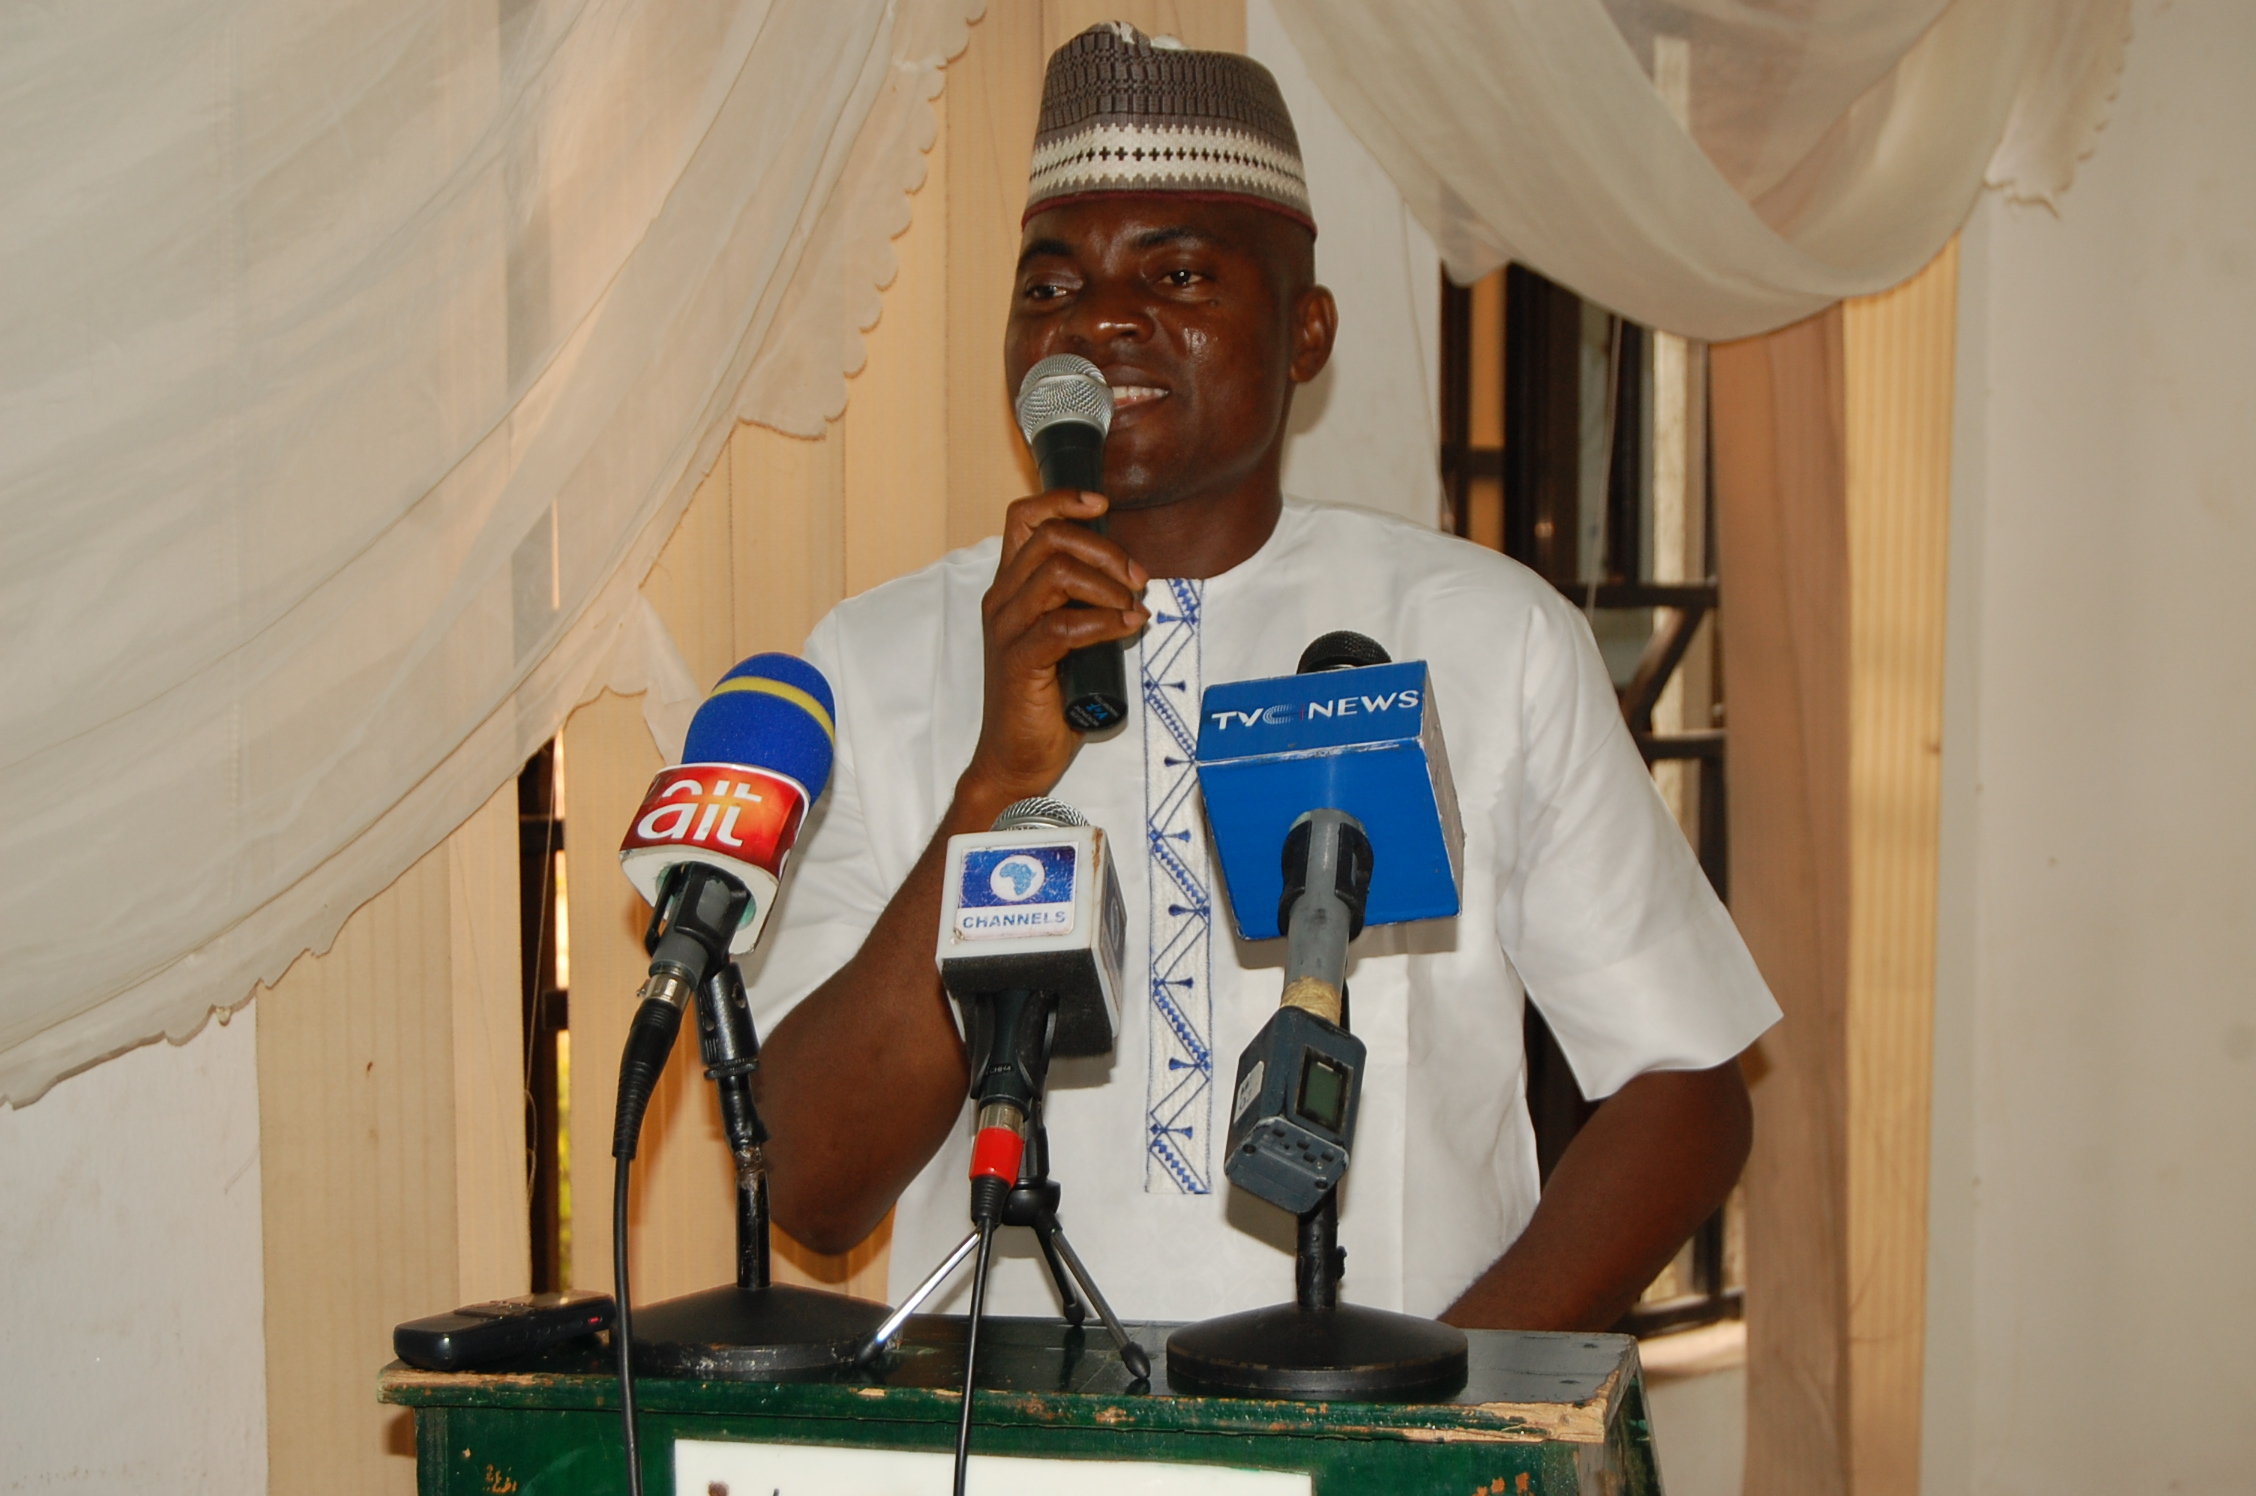 COVID-19: Kwara NUJ boss appointed member of FG's JTTT on emergency response